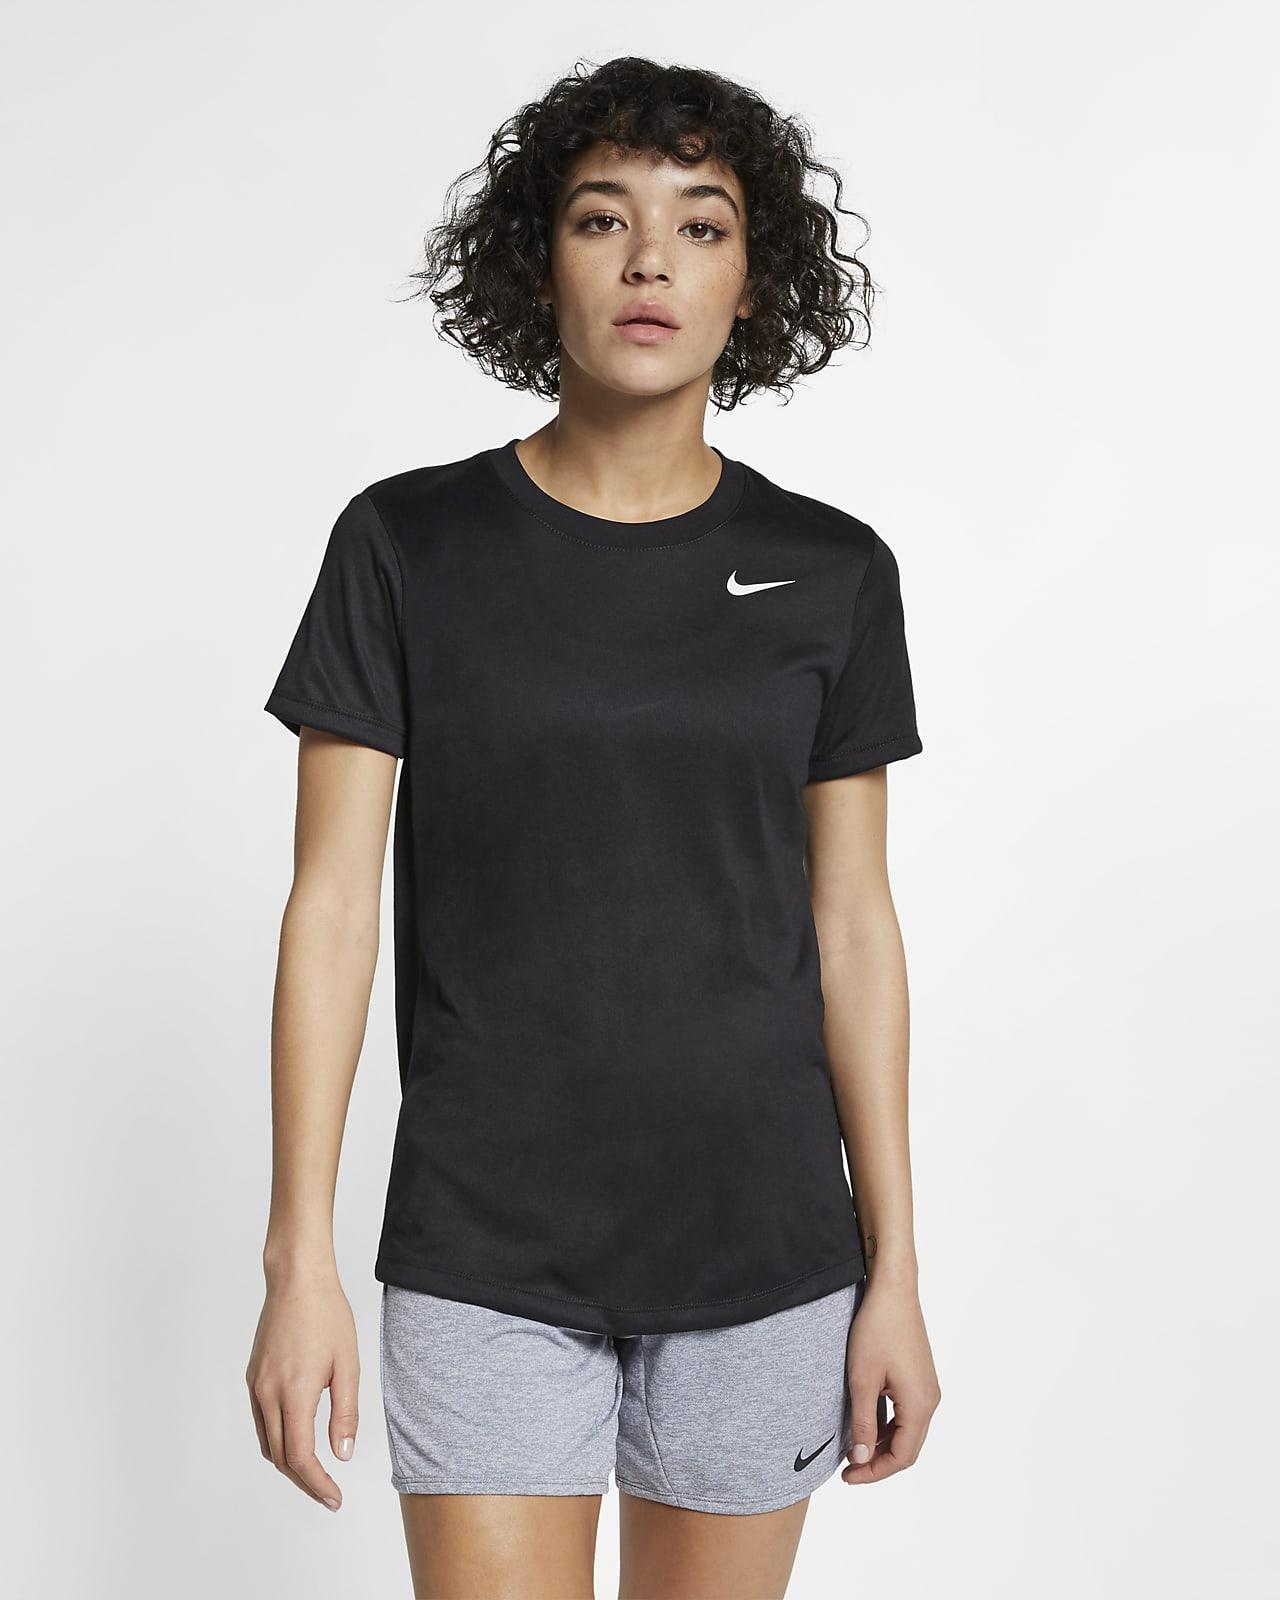 Nike Dri-FIT Women's Training T-Shirt